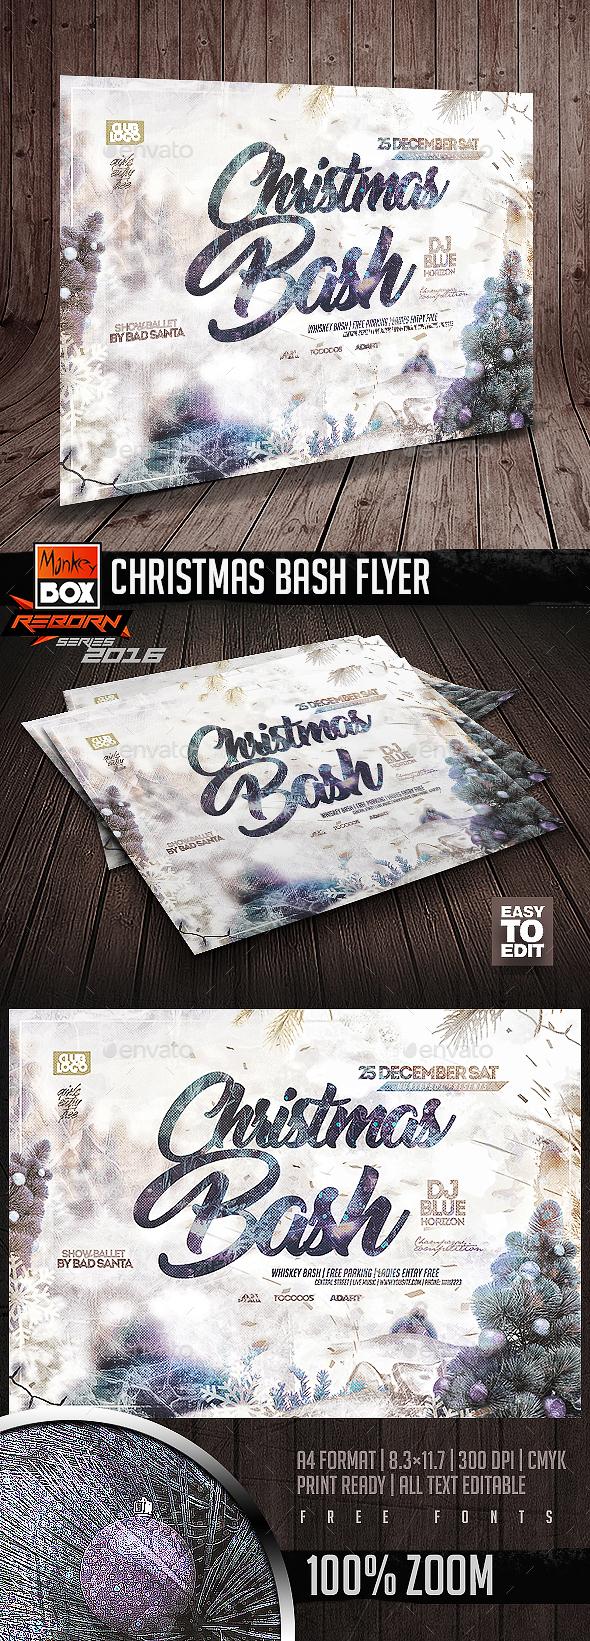 Christmas Bash Flyer - Flyers Print Templates